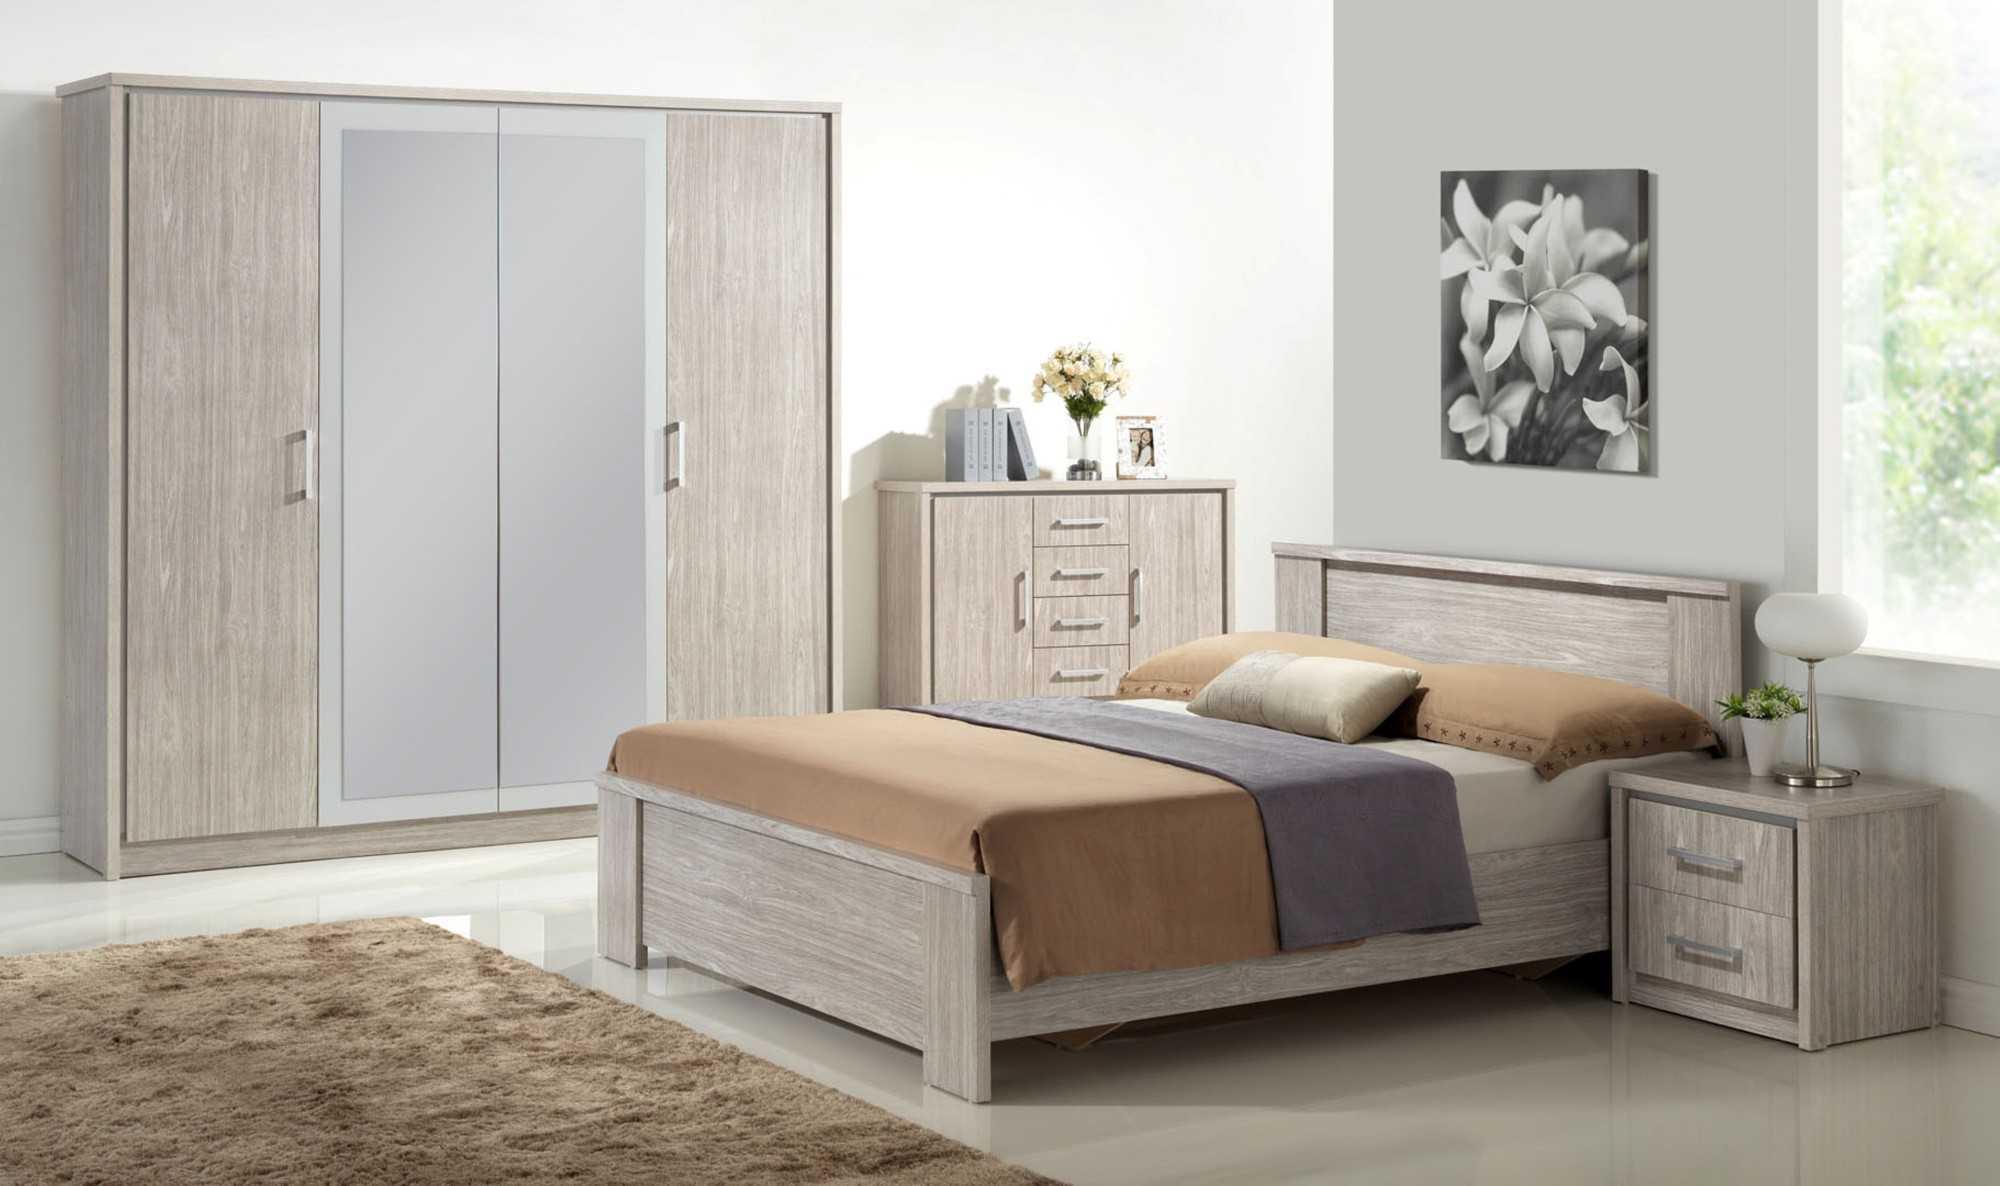 Design Meuble Chambre Adulte But